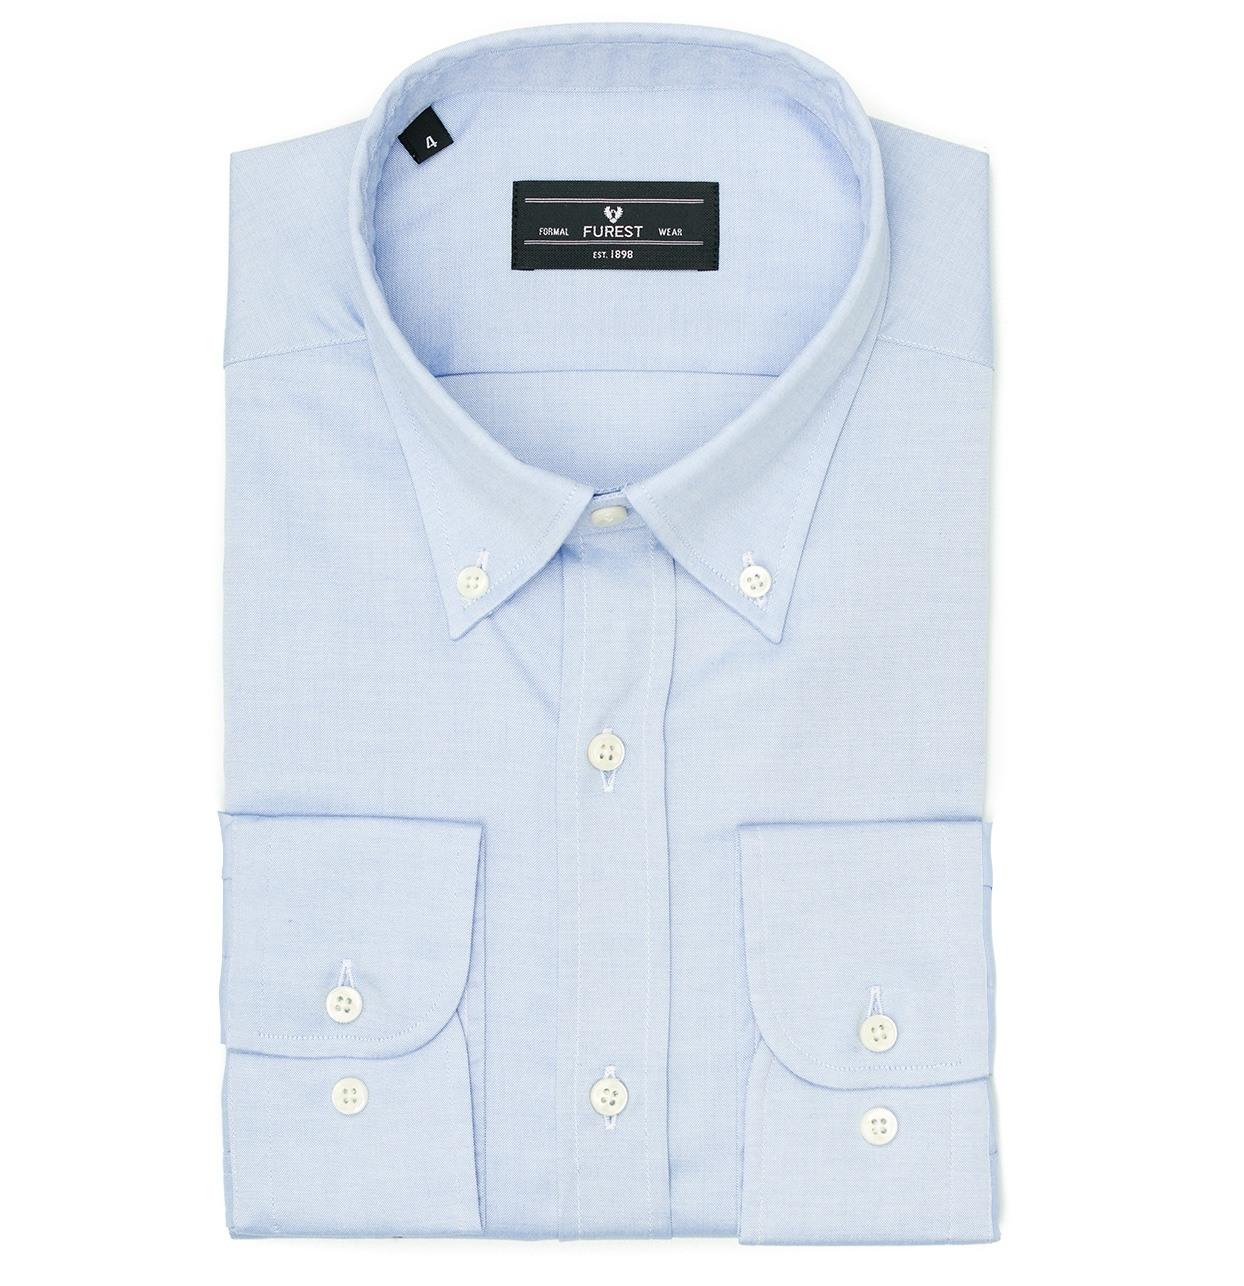 Camisa Formal Wear REGULAR FIT Modelo BOTTON DOWN Tejido Pin point color azul, 100% Algodón